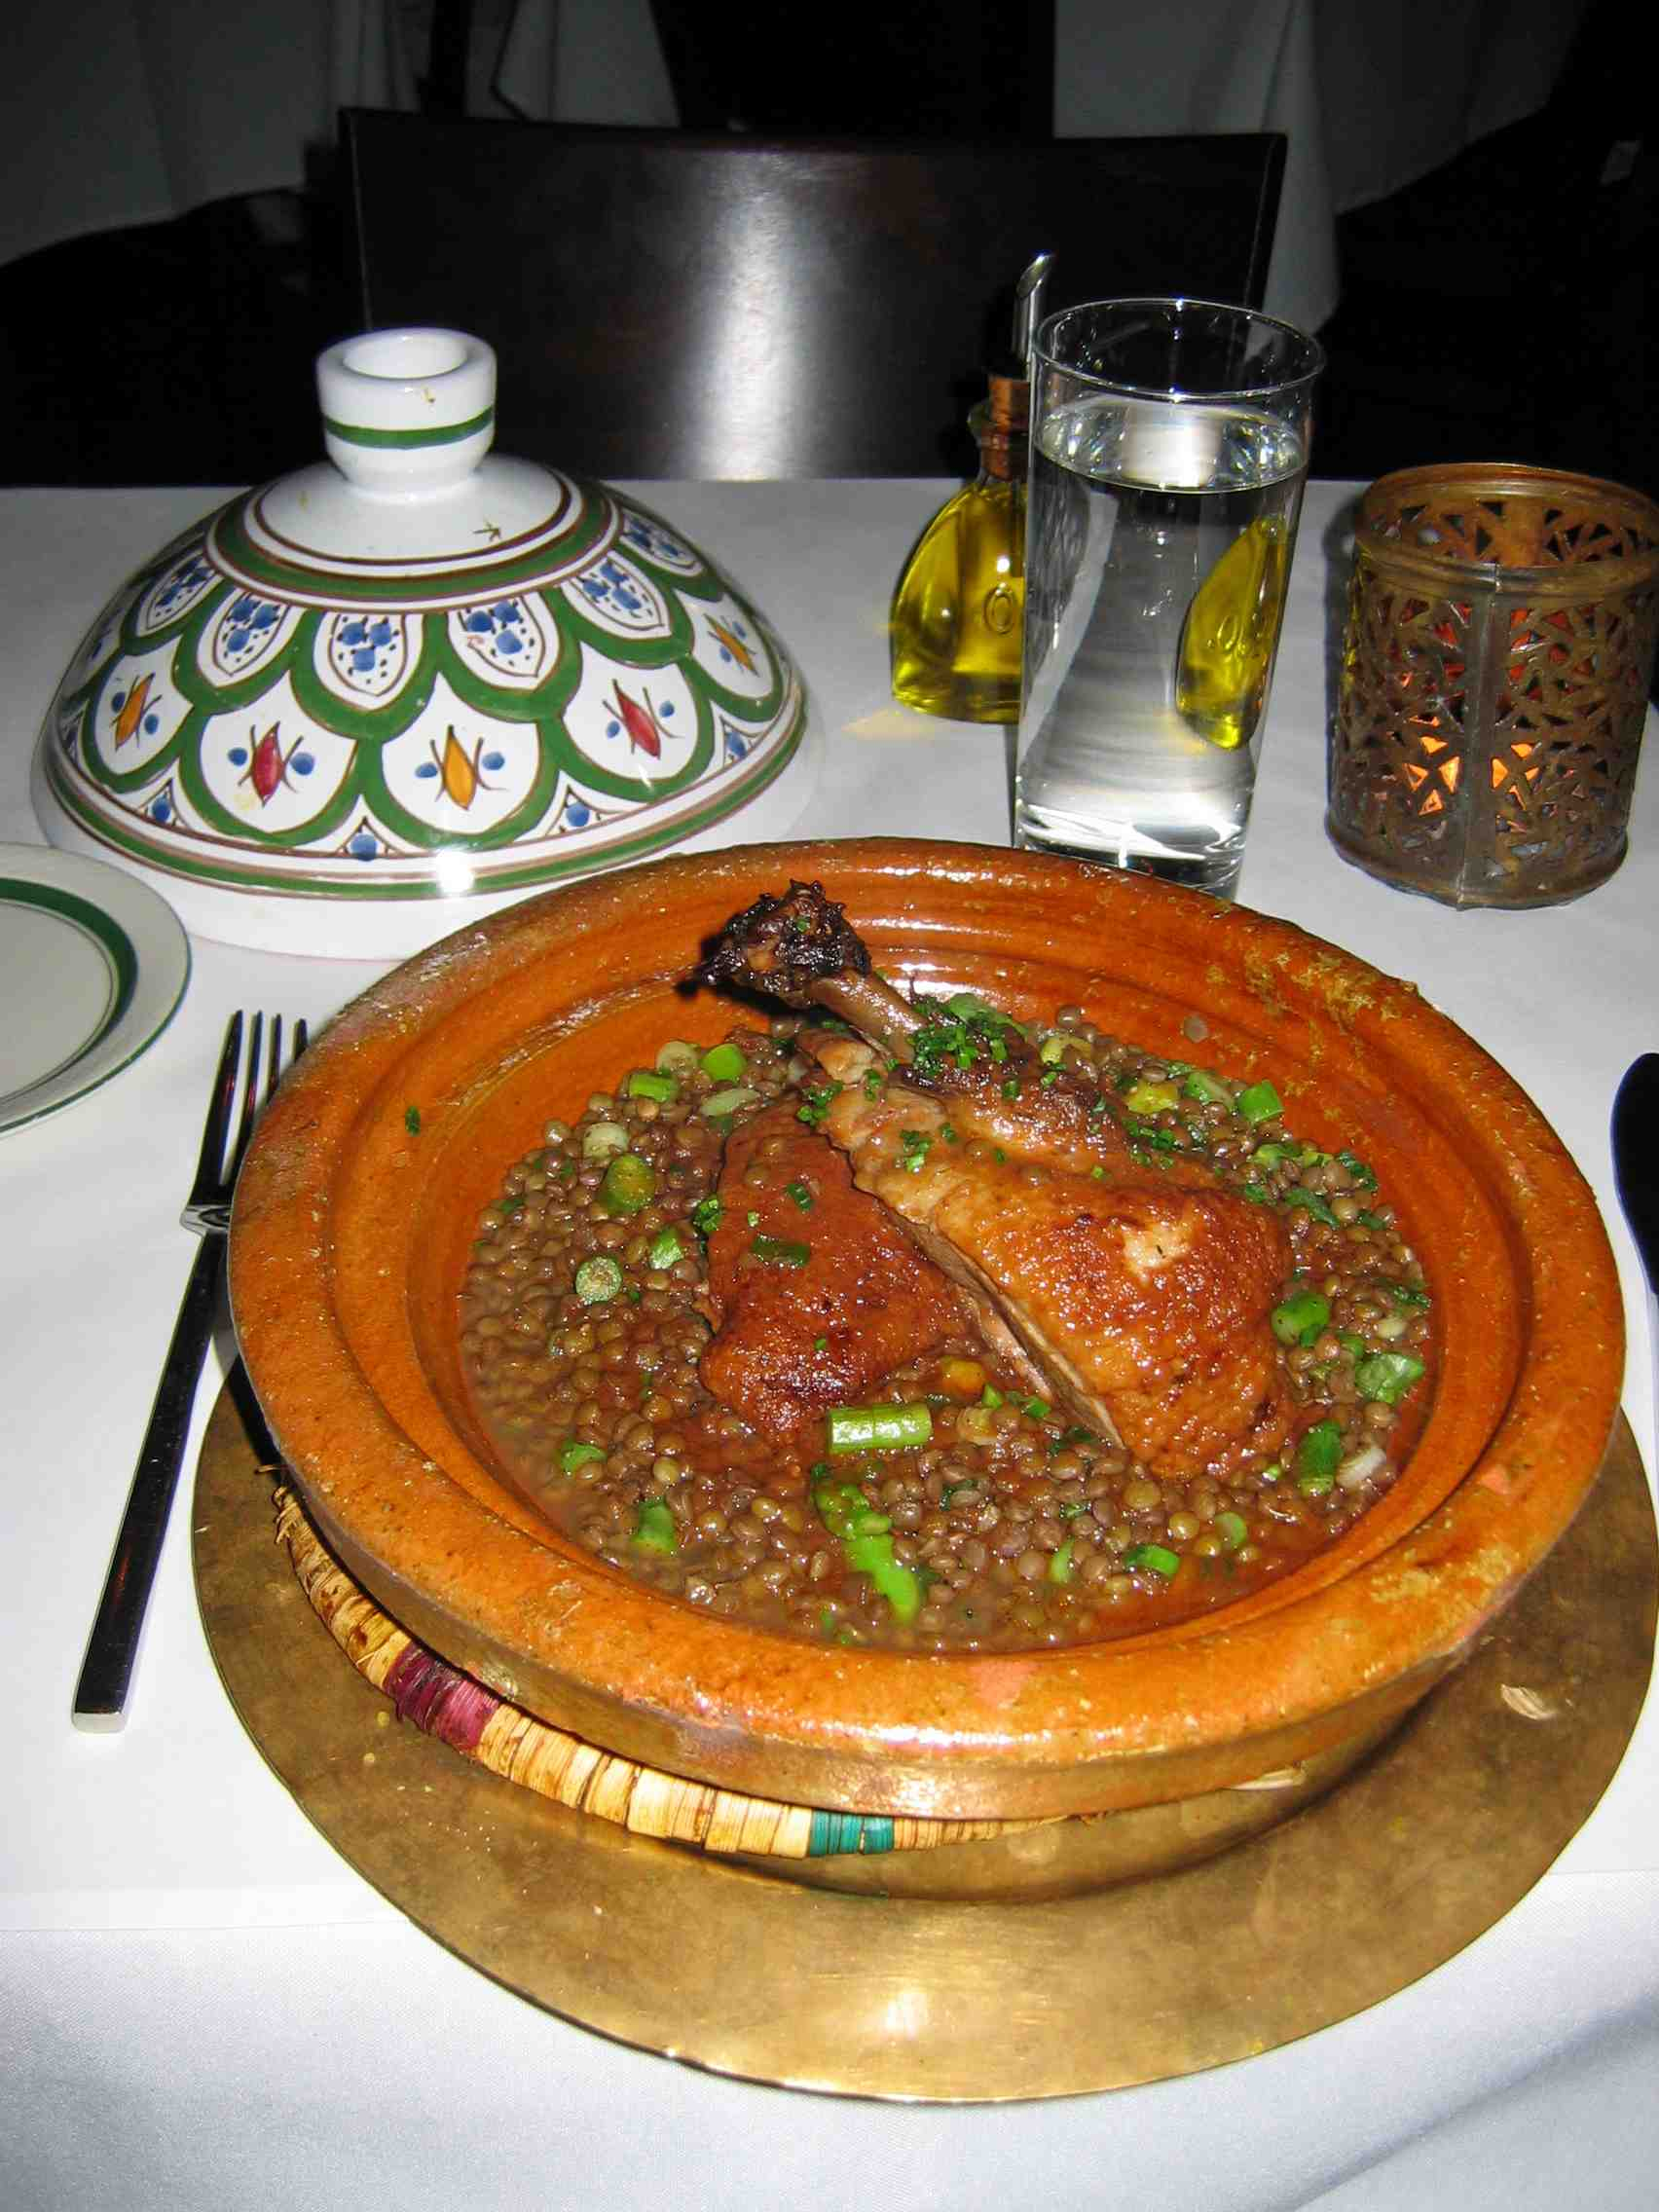 Deux Restaurants A New York L Un Franco Maghrebin L Autre Africain